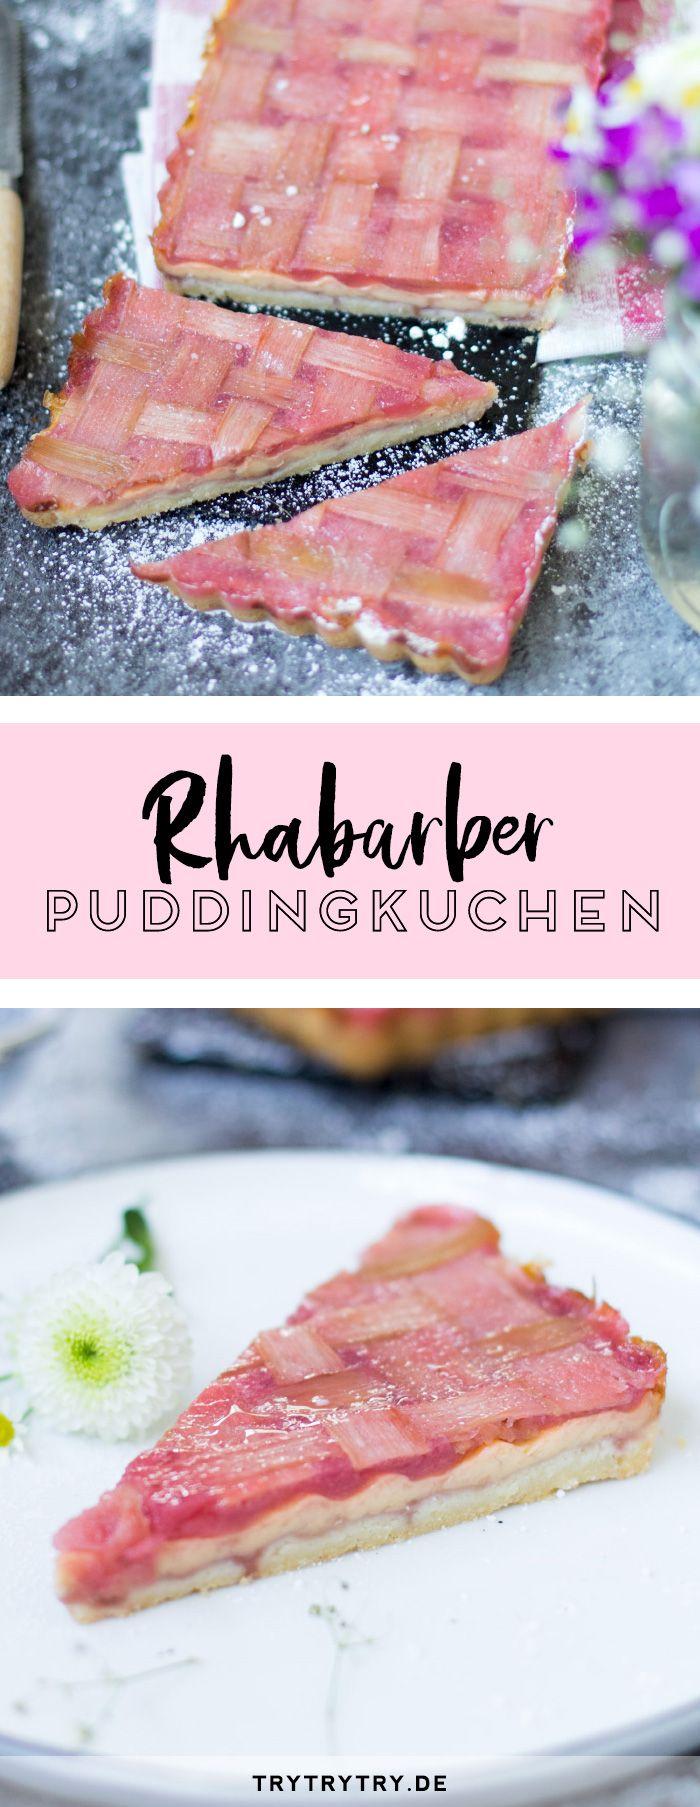 Rhabarber-Puddingkuchen mit Erdbeer-Mousse #octoberfestfood